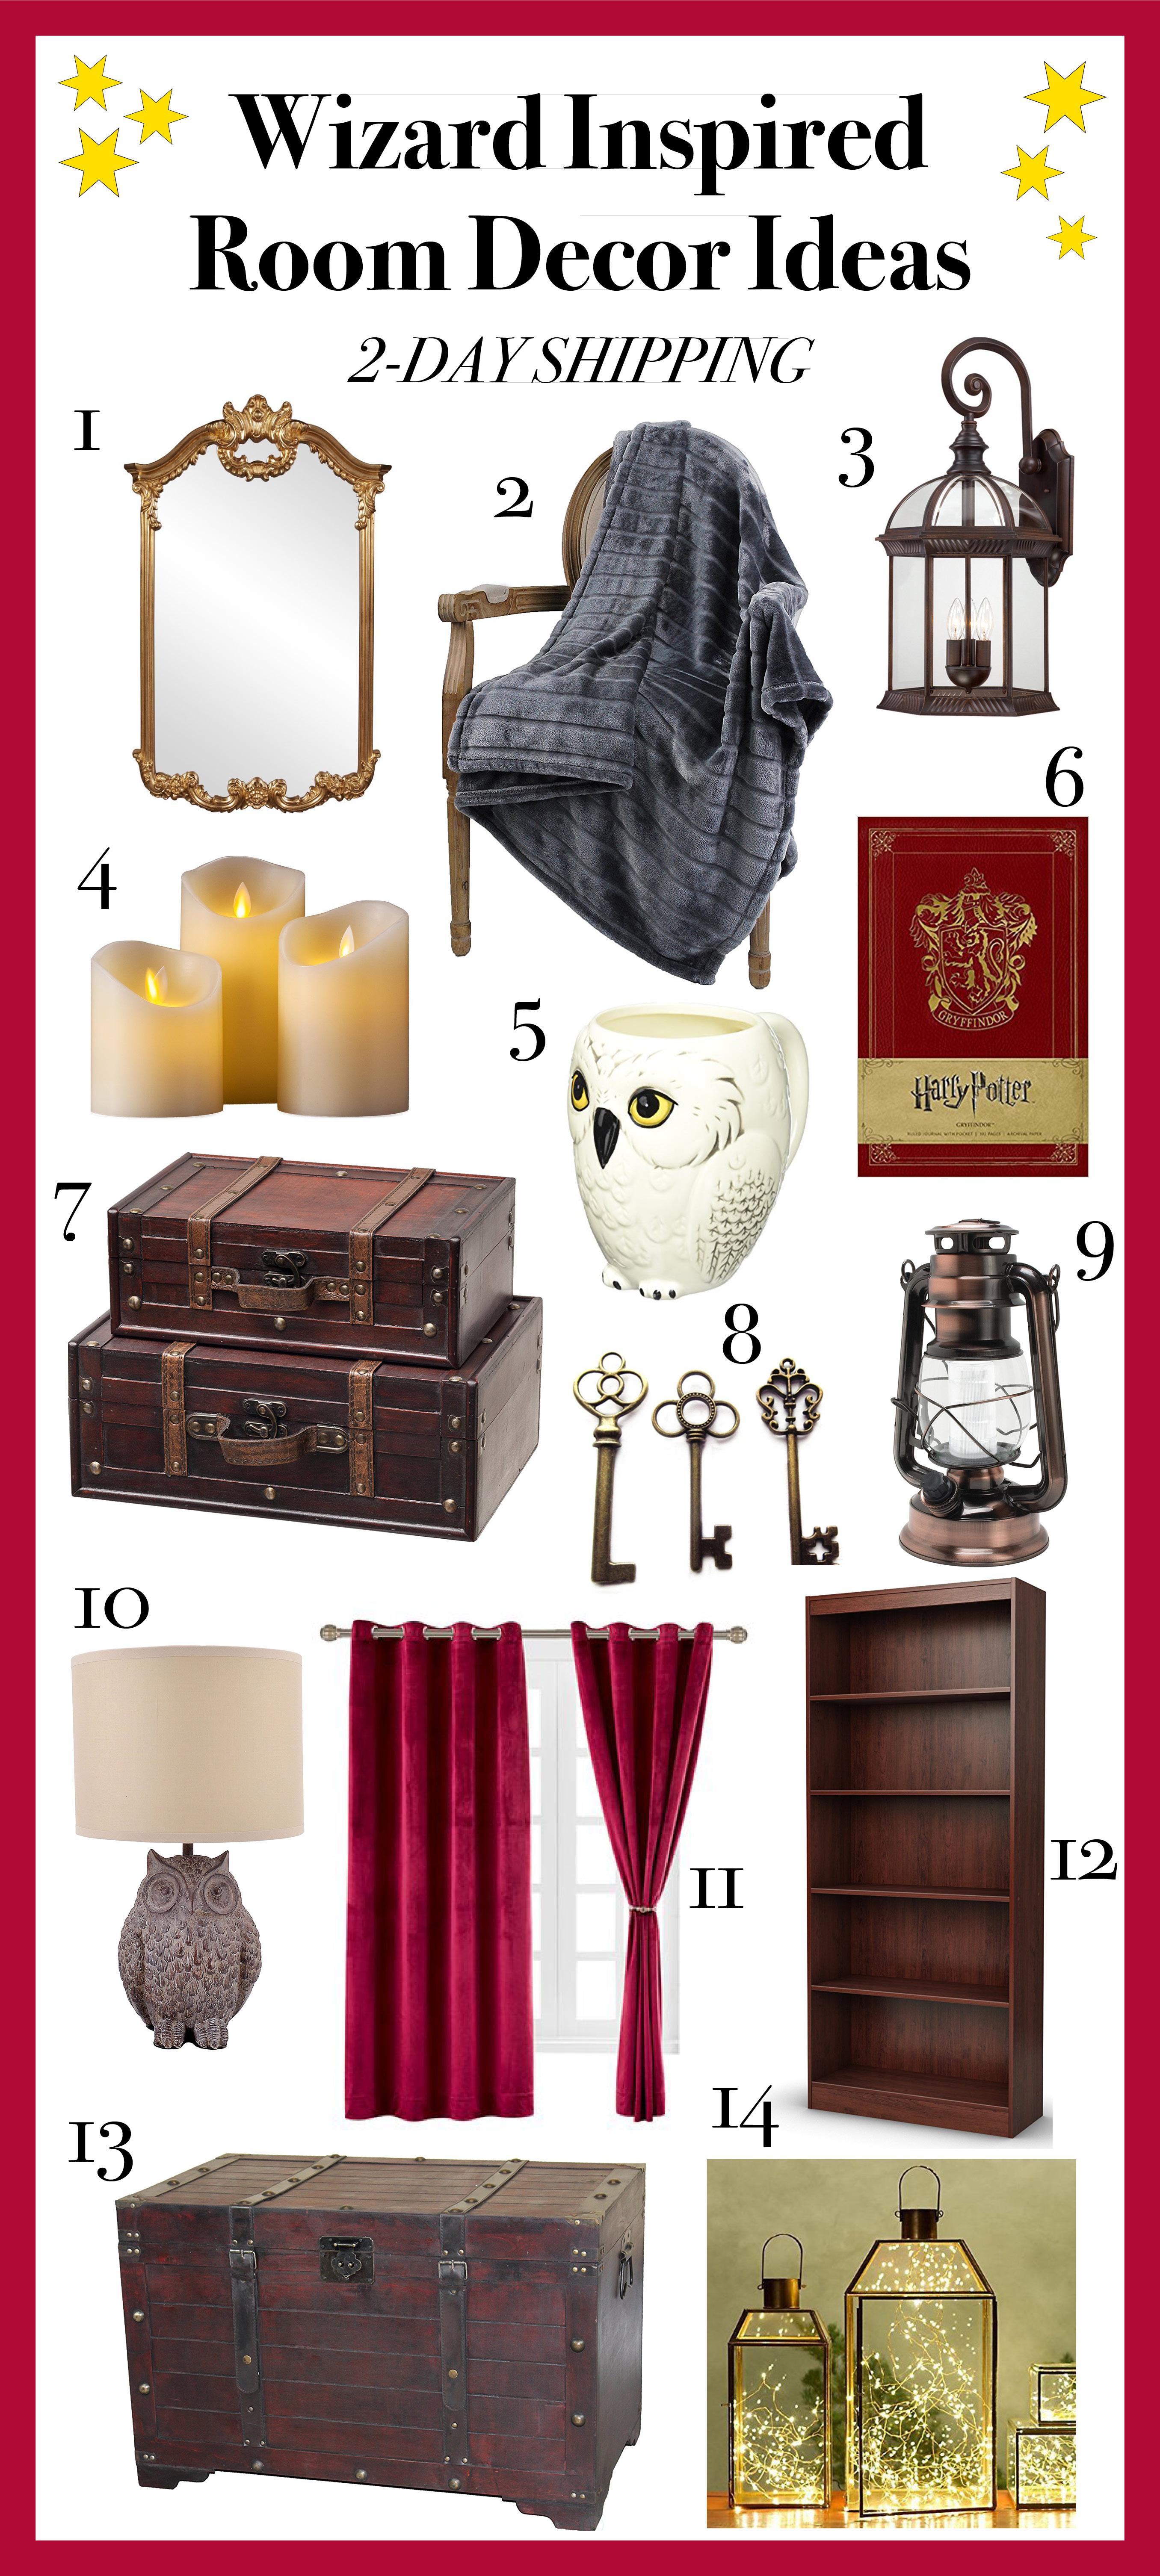 Harry Potter Room Decor Ideas Wizard Inspired Bedroom Ideas